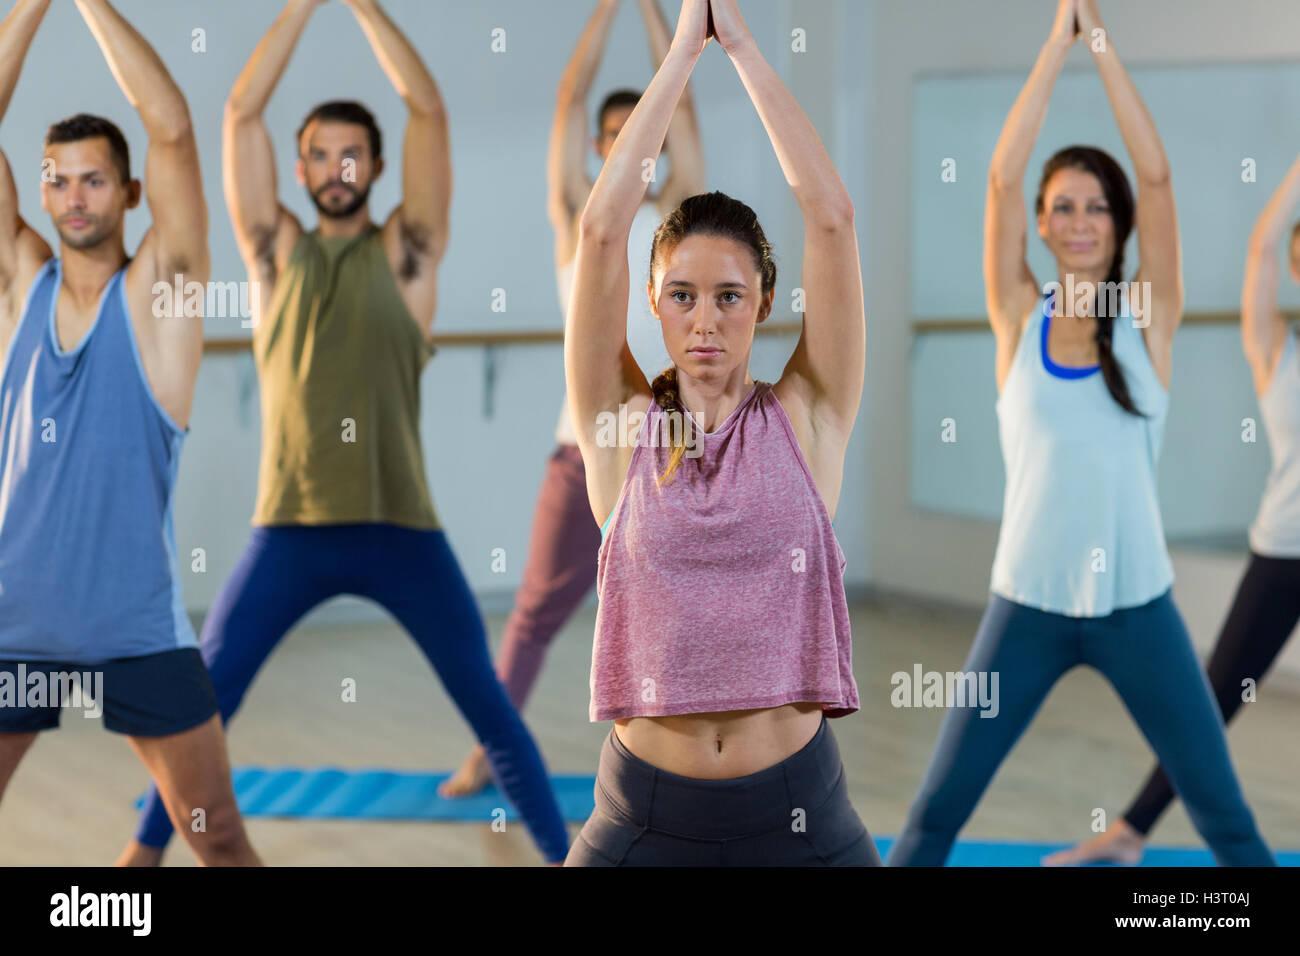 Assunzione di istruttore yoga classe Immagini Stock